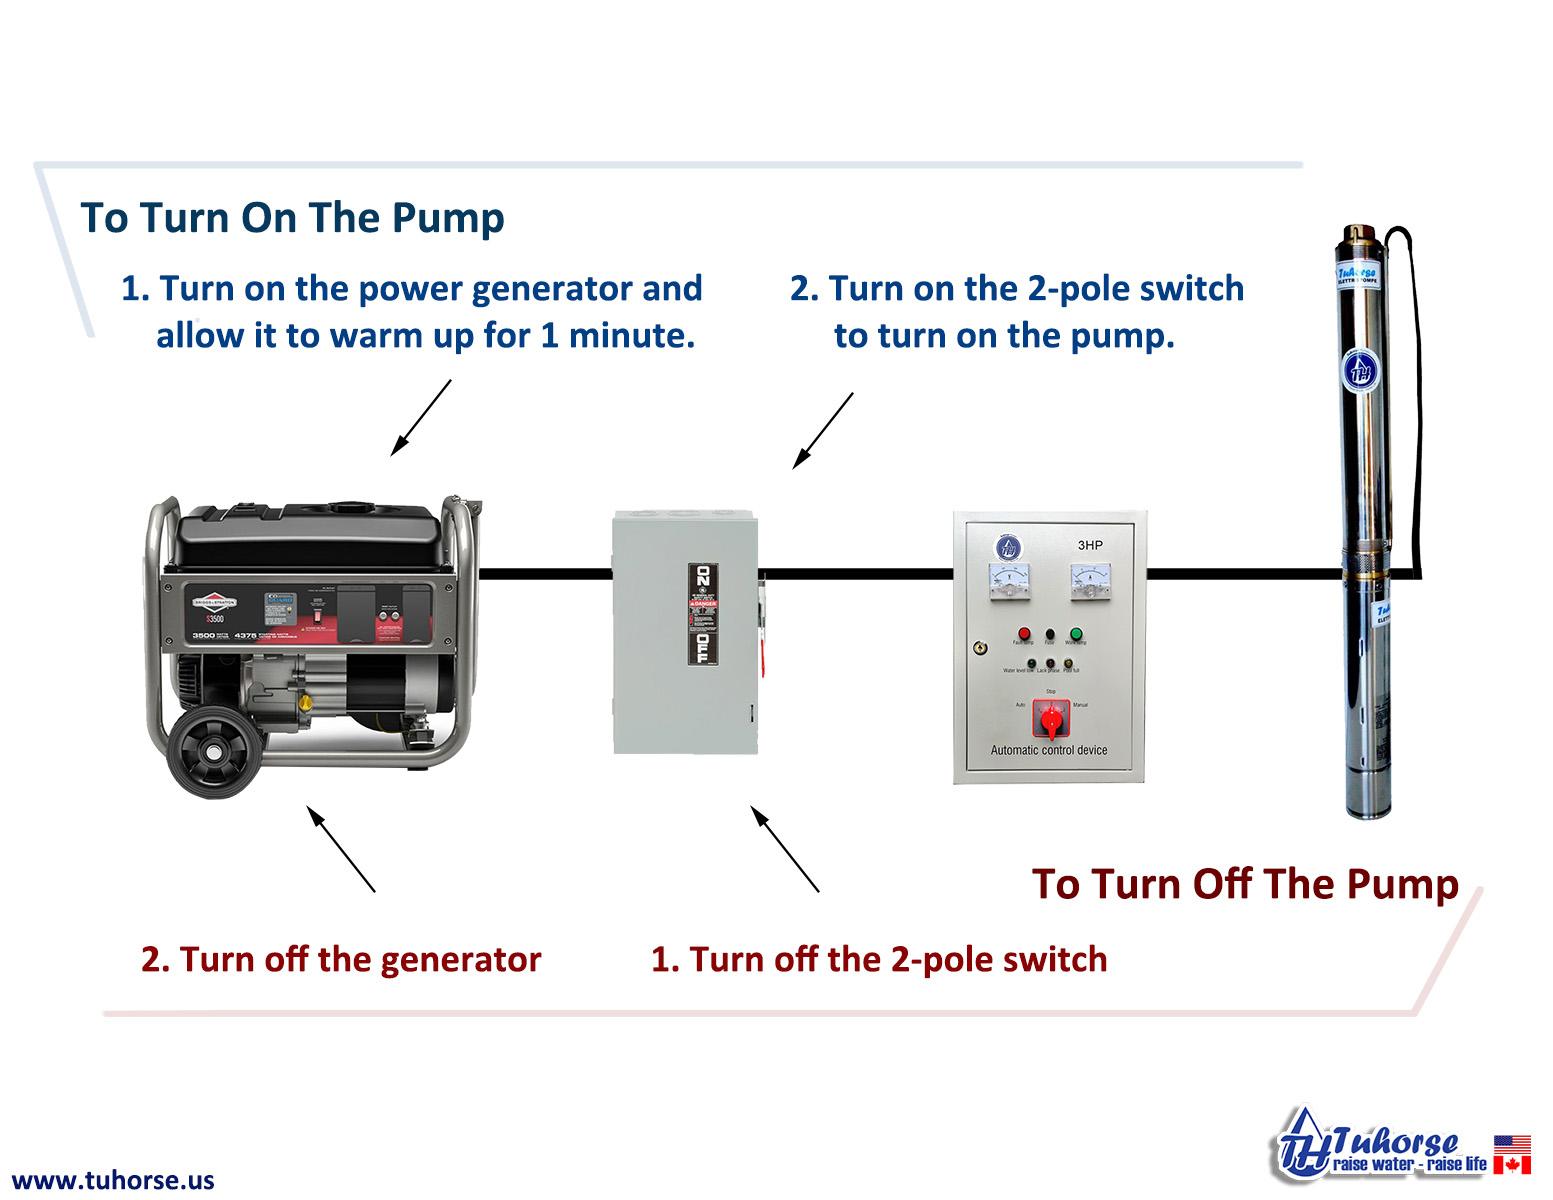 tuhorse-pumps-generator-usage-operation.jpg